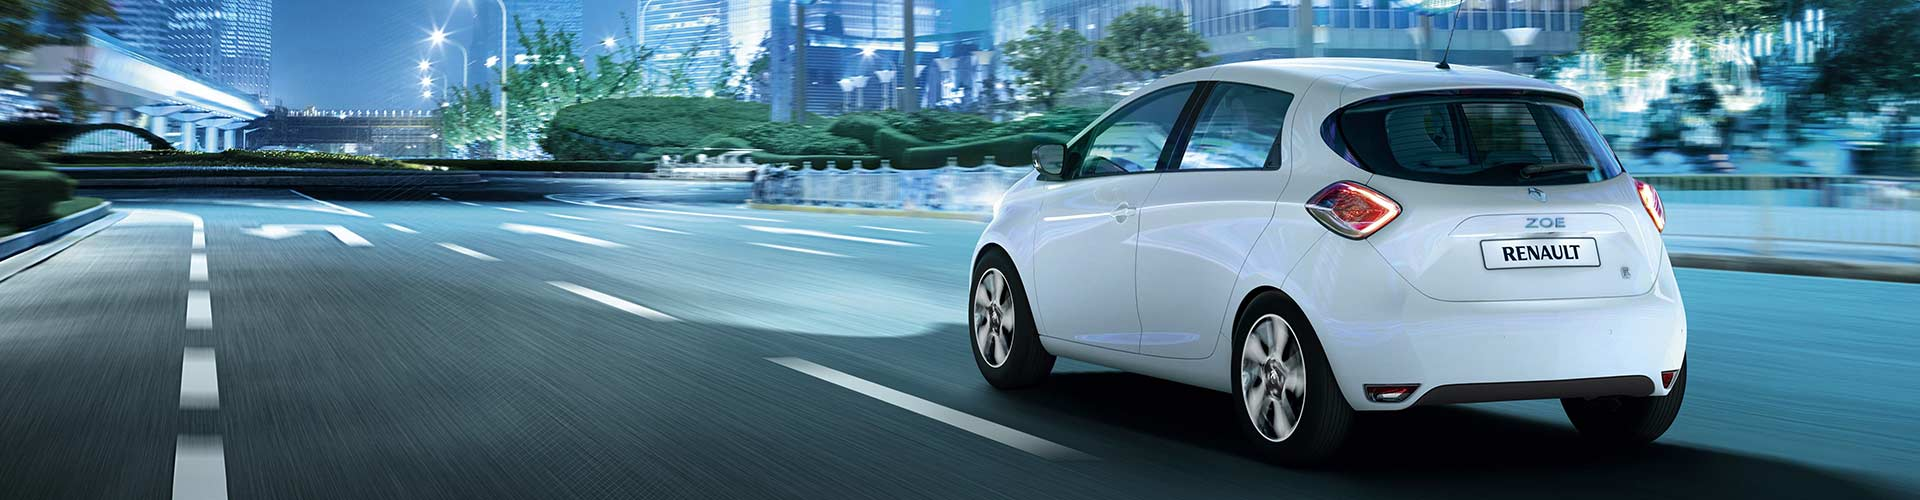 Renault-ZOE-ADAC-Aktion